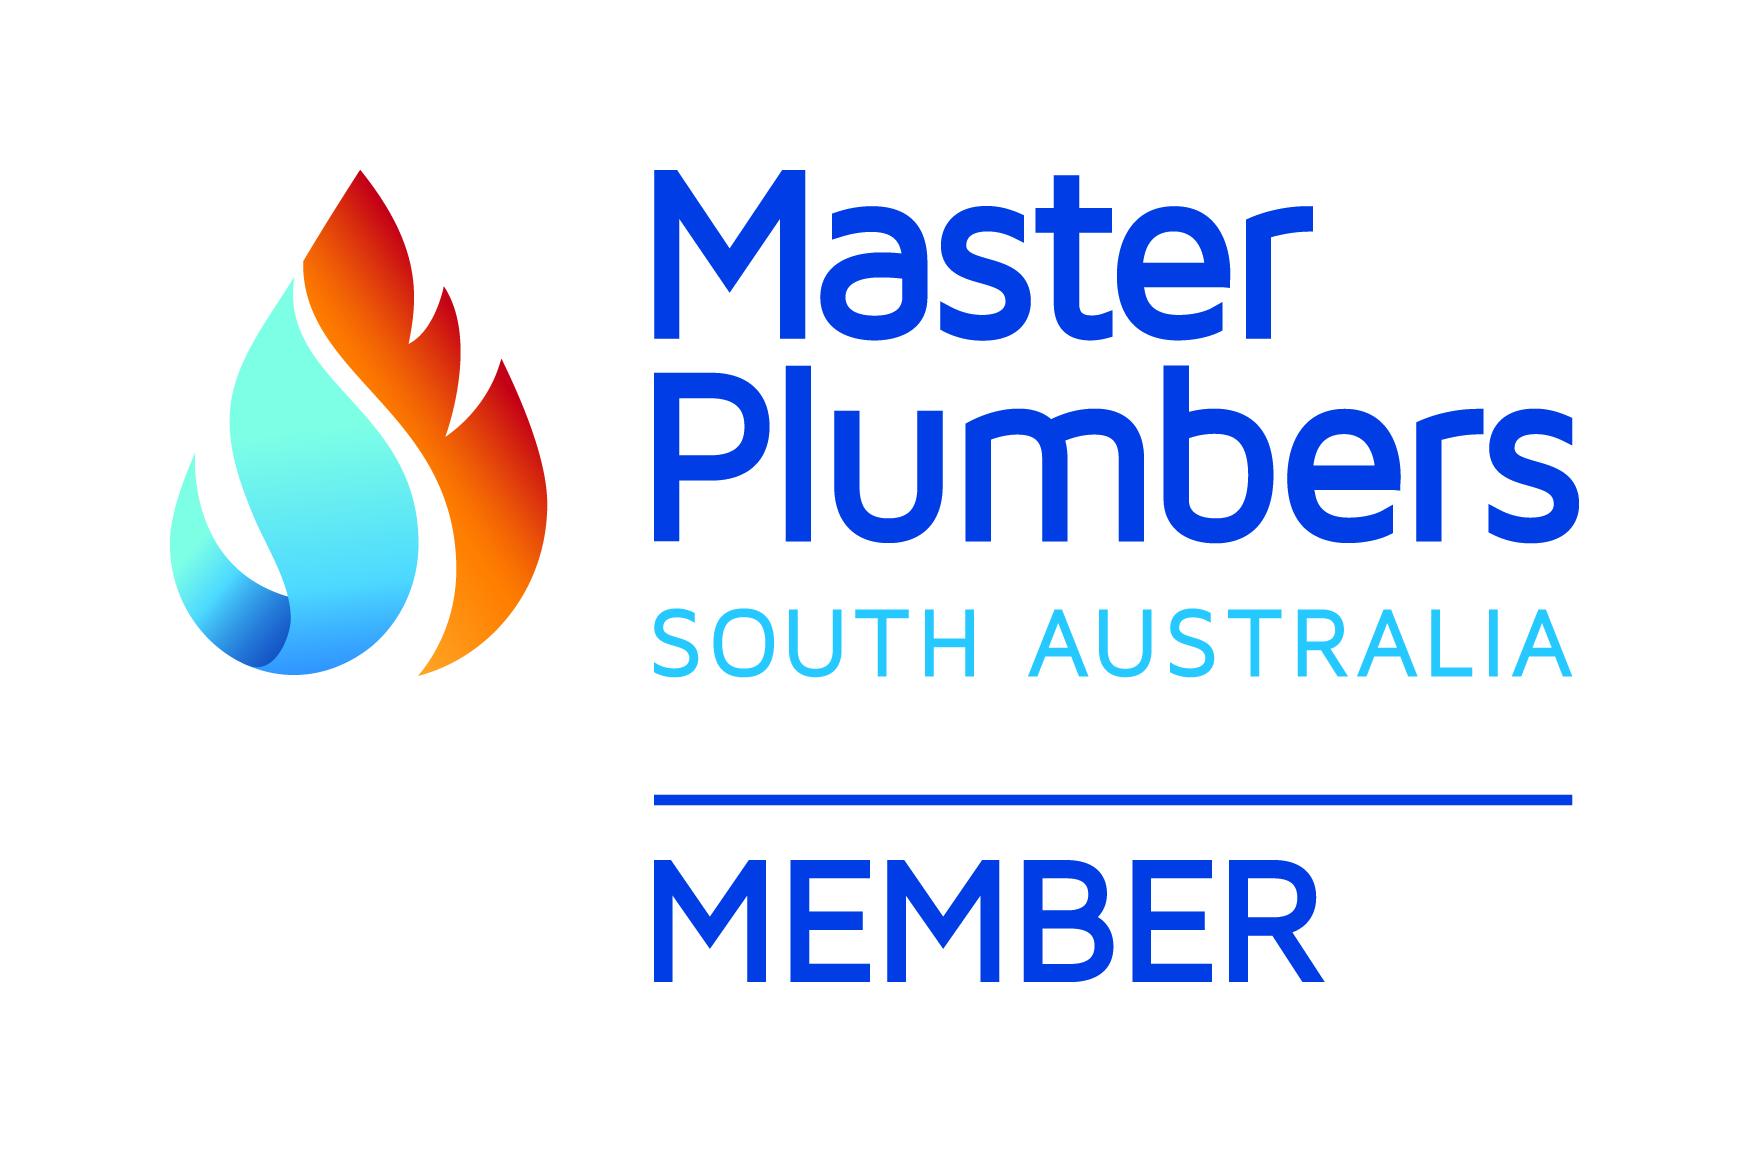 Master Plumbers Association